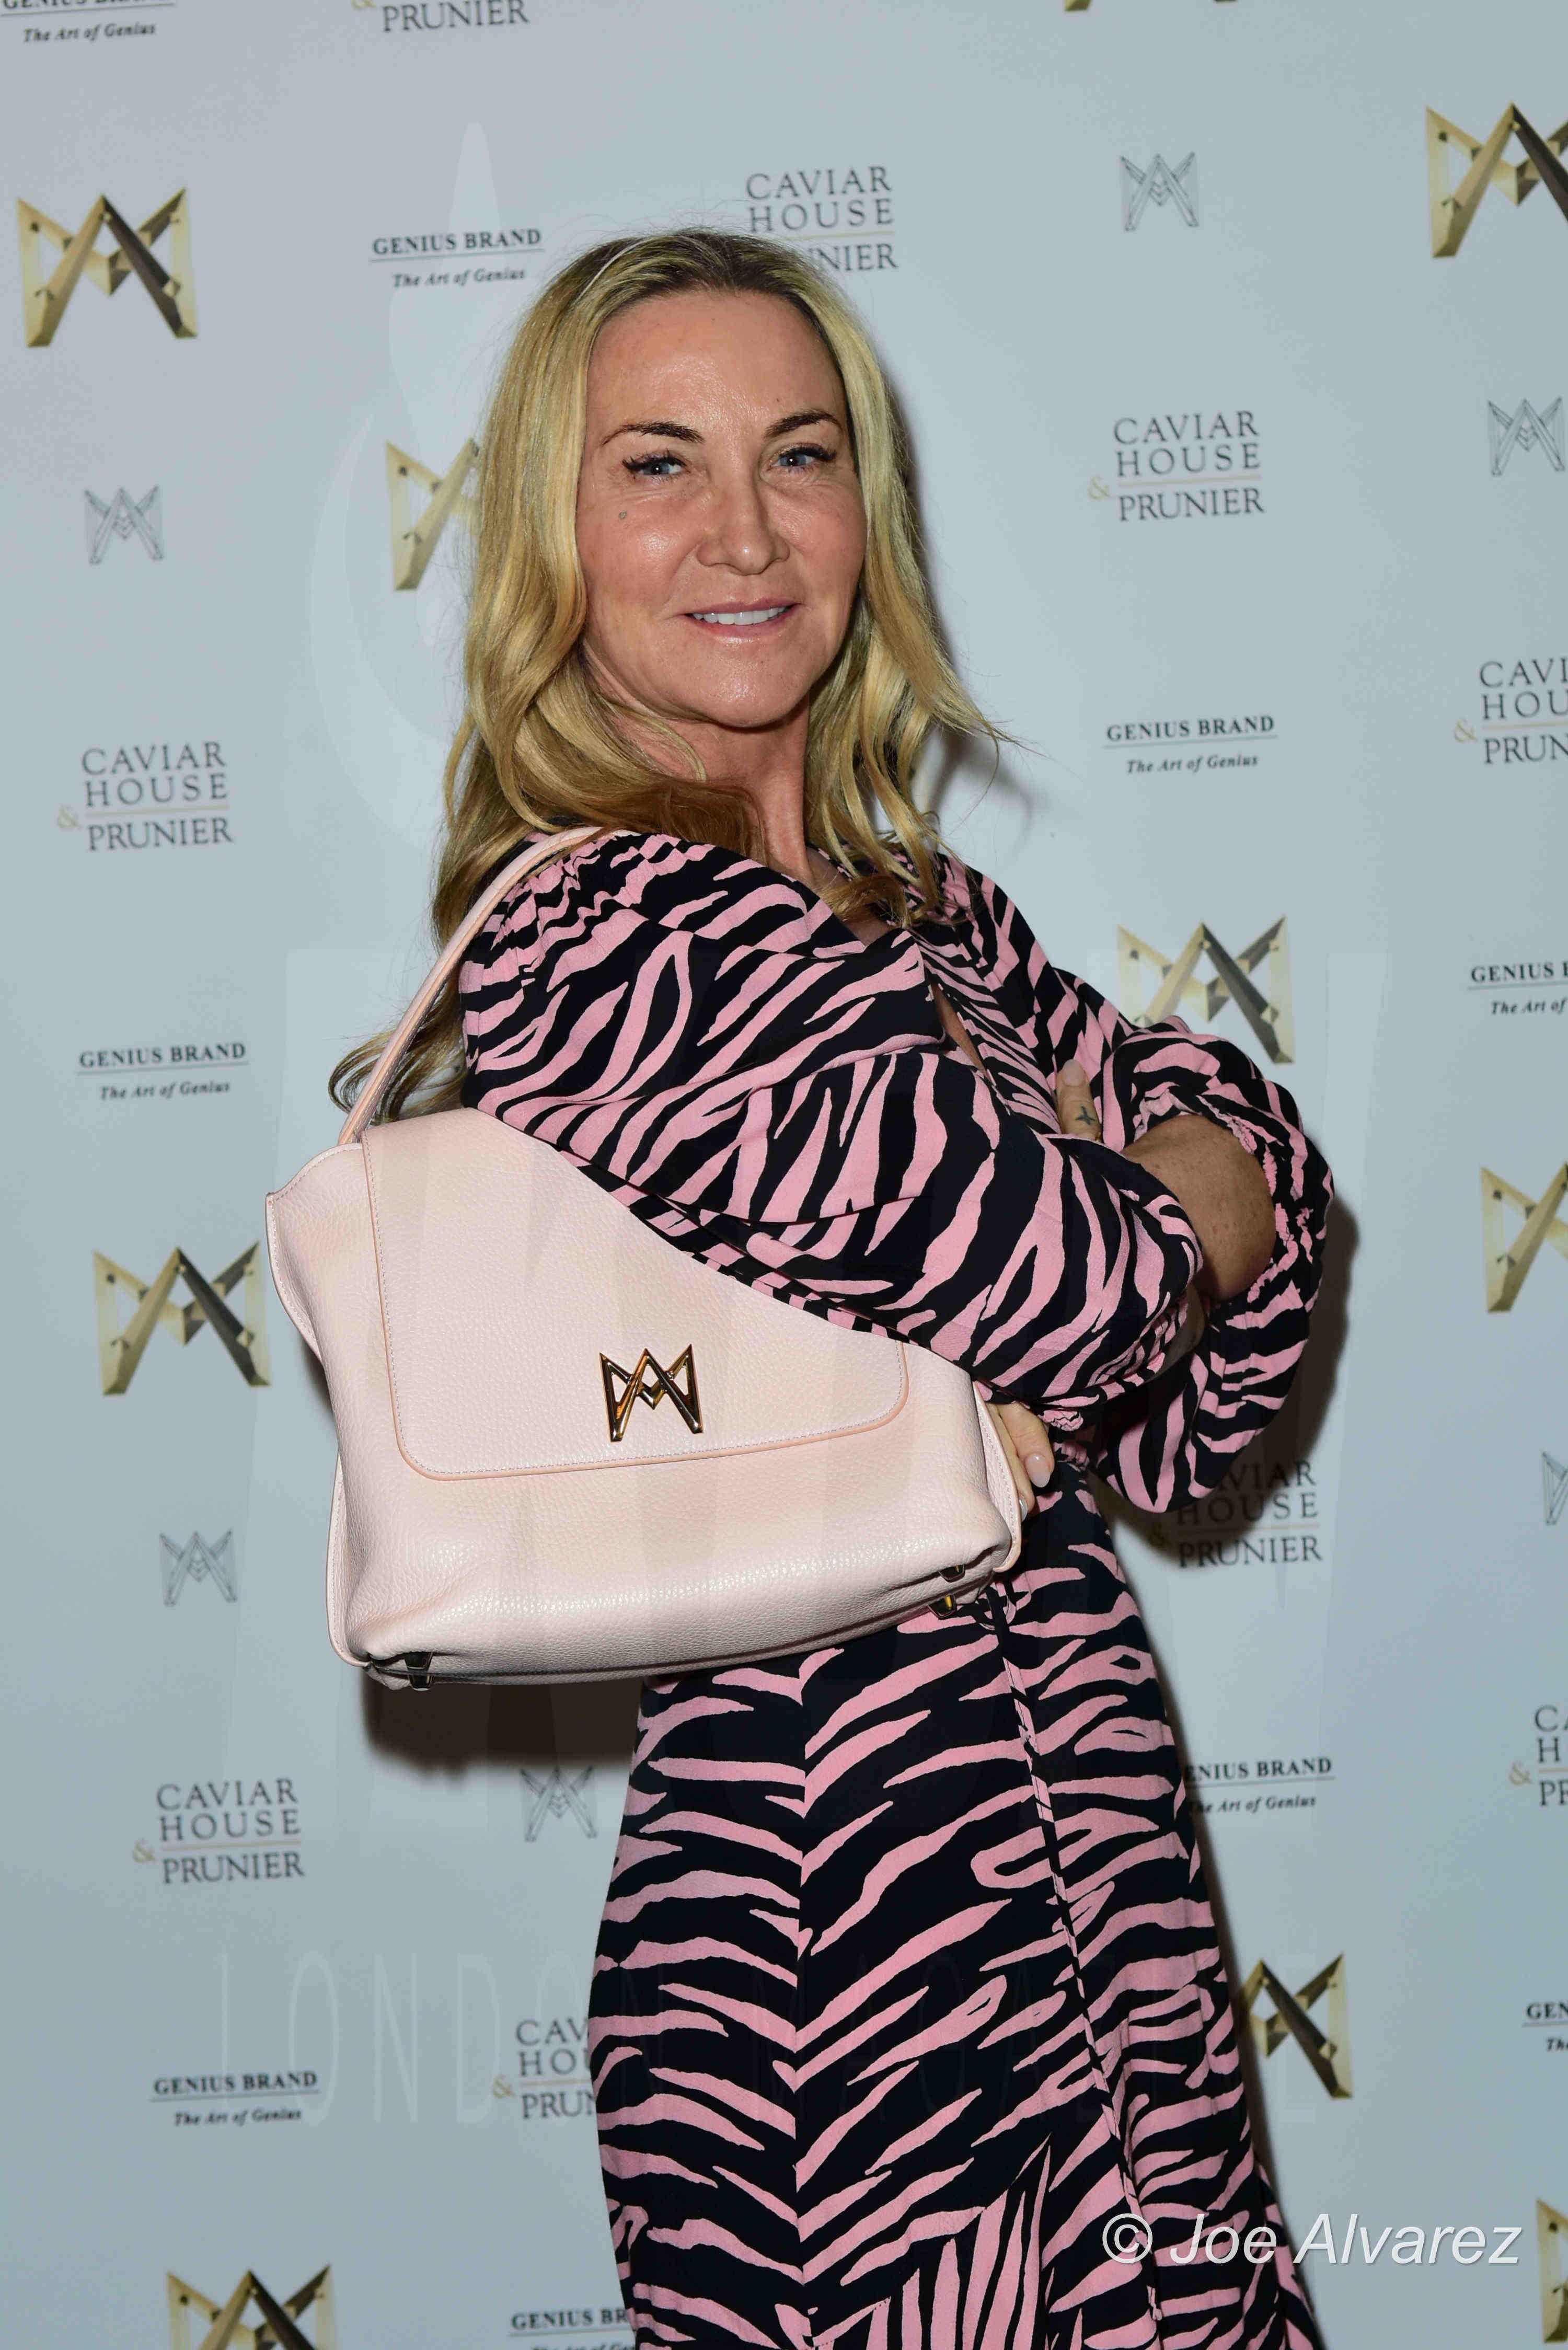 Meg Mathews AMA bags launch party, Caviar House, Piccadilly, London. Copyright © JOE ALVAREZ